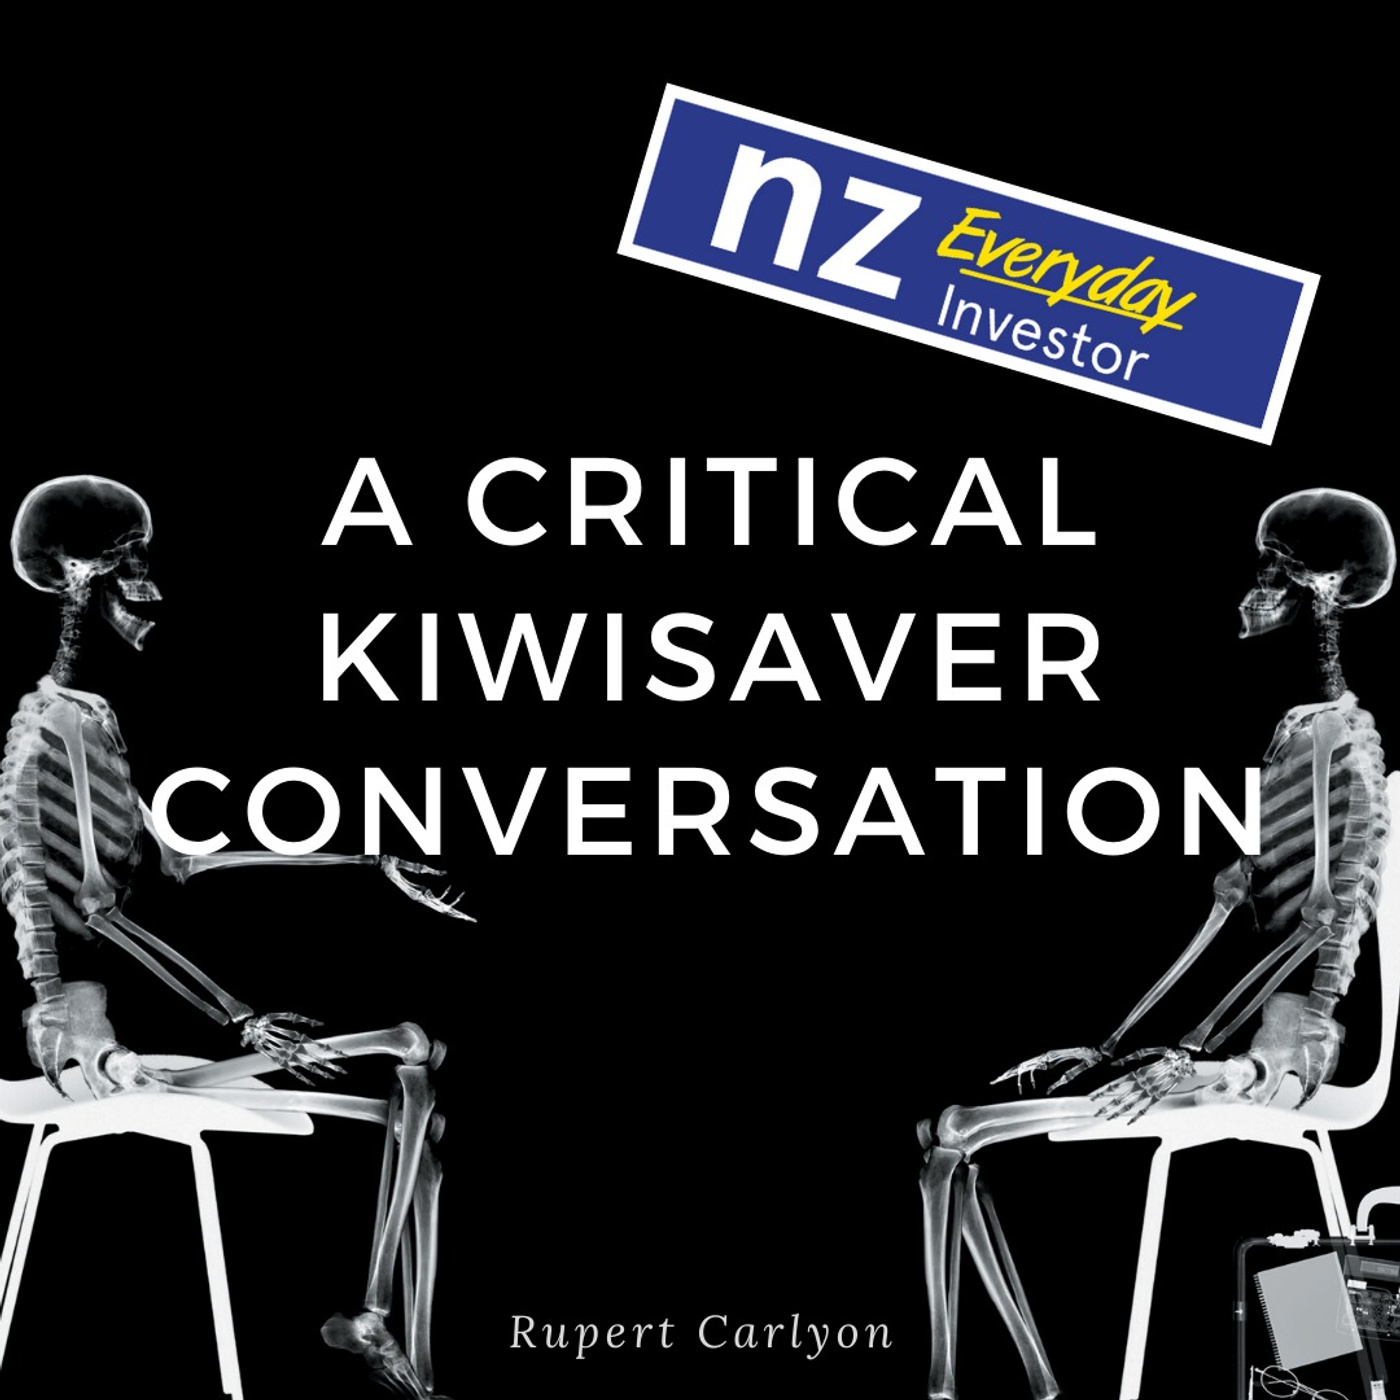 A Critical KiwiSaver Conversation / Rupert Carlyon